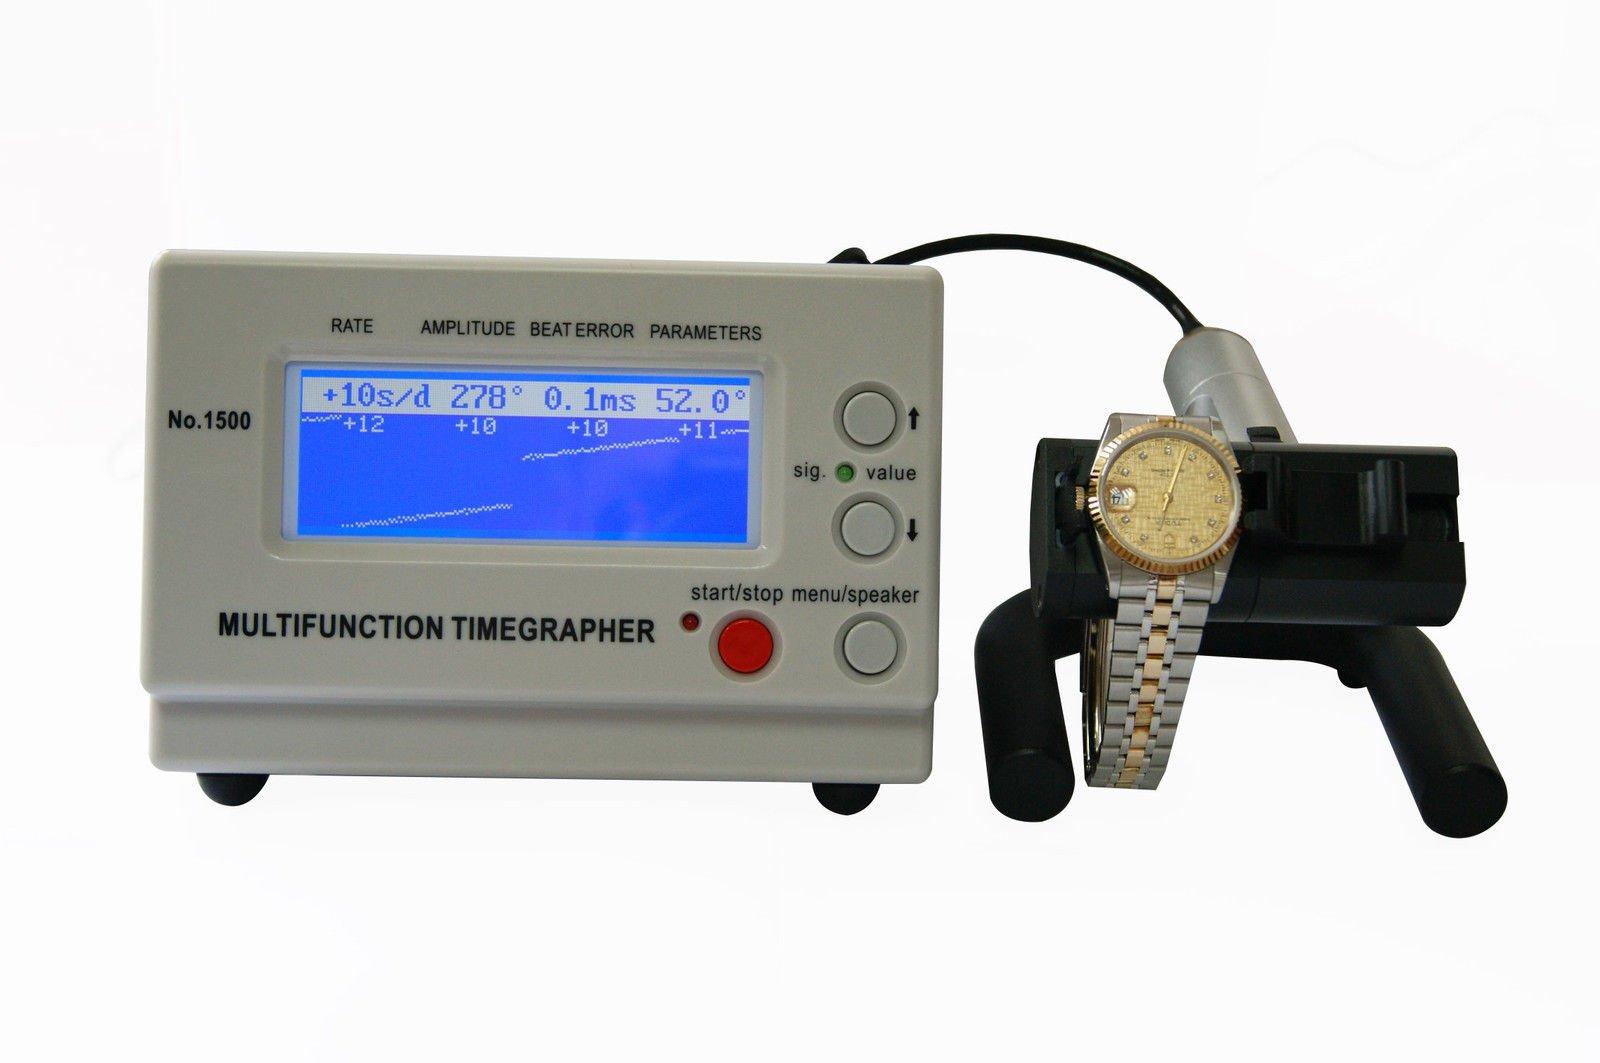 ELEOPTION Mechanical watch timing tester Timegrapher LCD Multifunction MTG-1000 by Eleoption